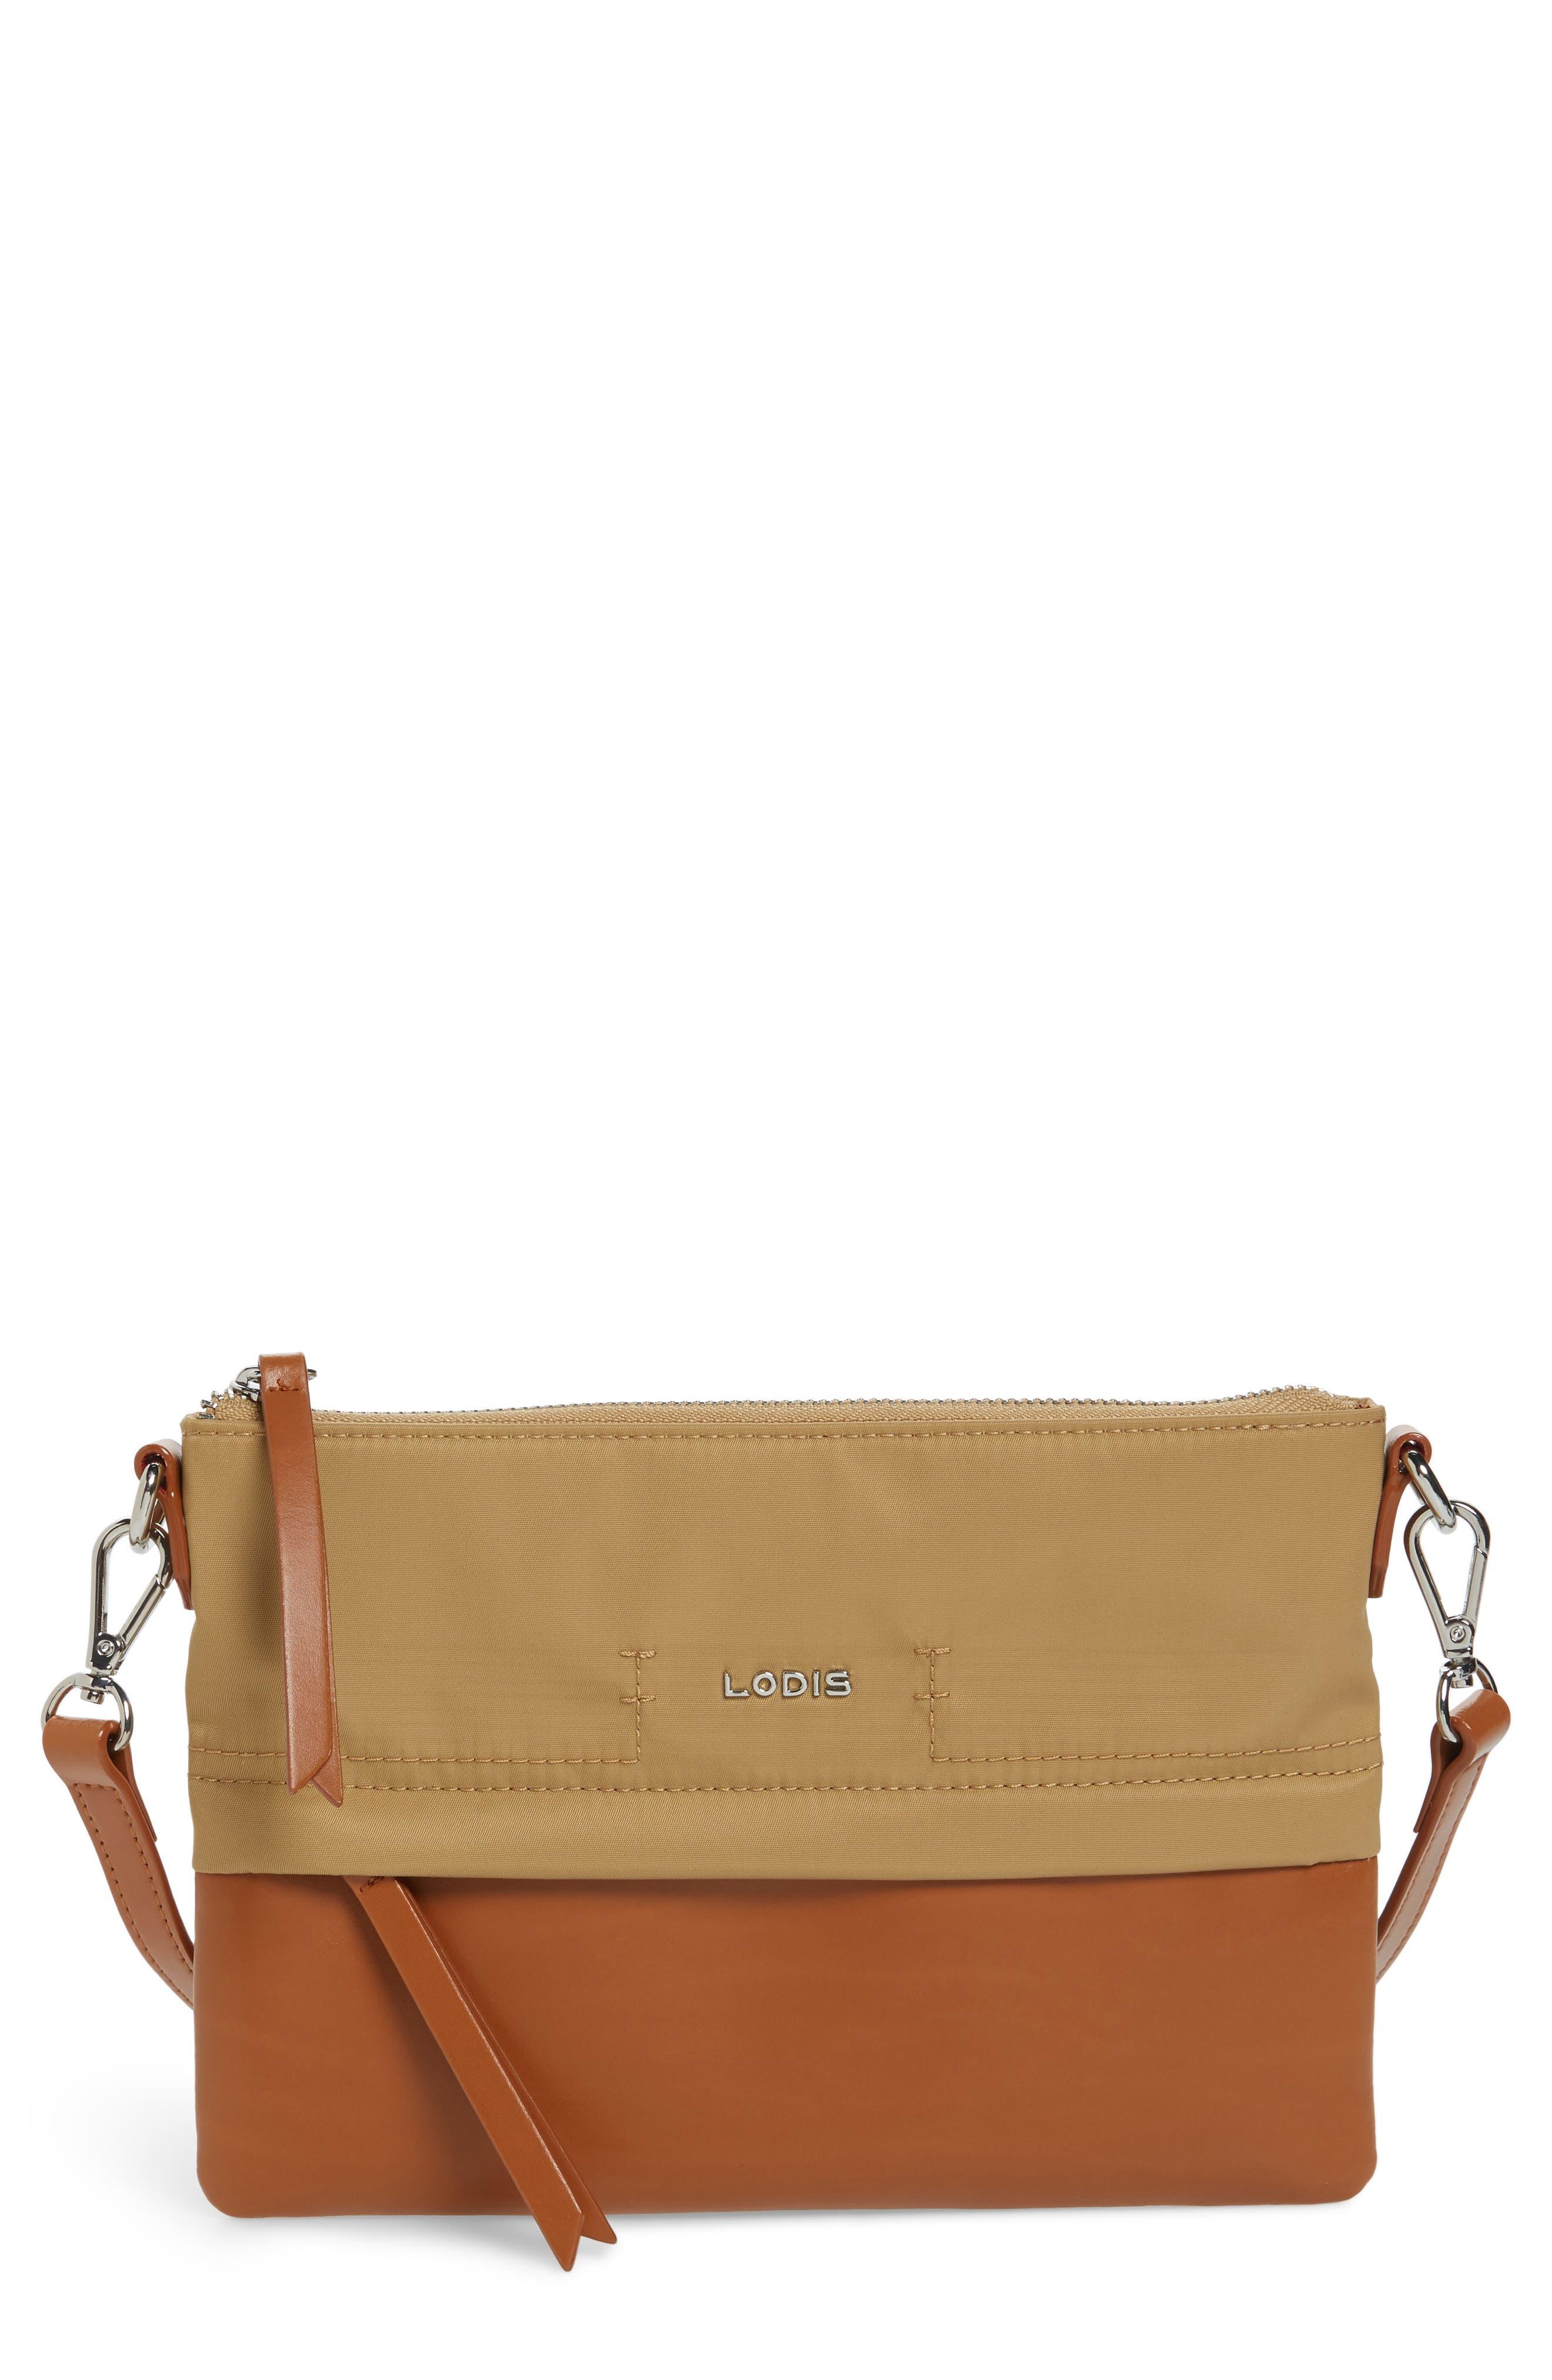 Main Image - LODIS Los Angeles Kate Under Lock & Key Kala Leather Convertible Crossbody Bag